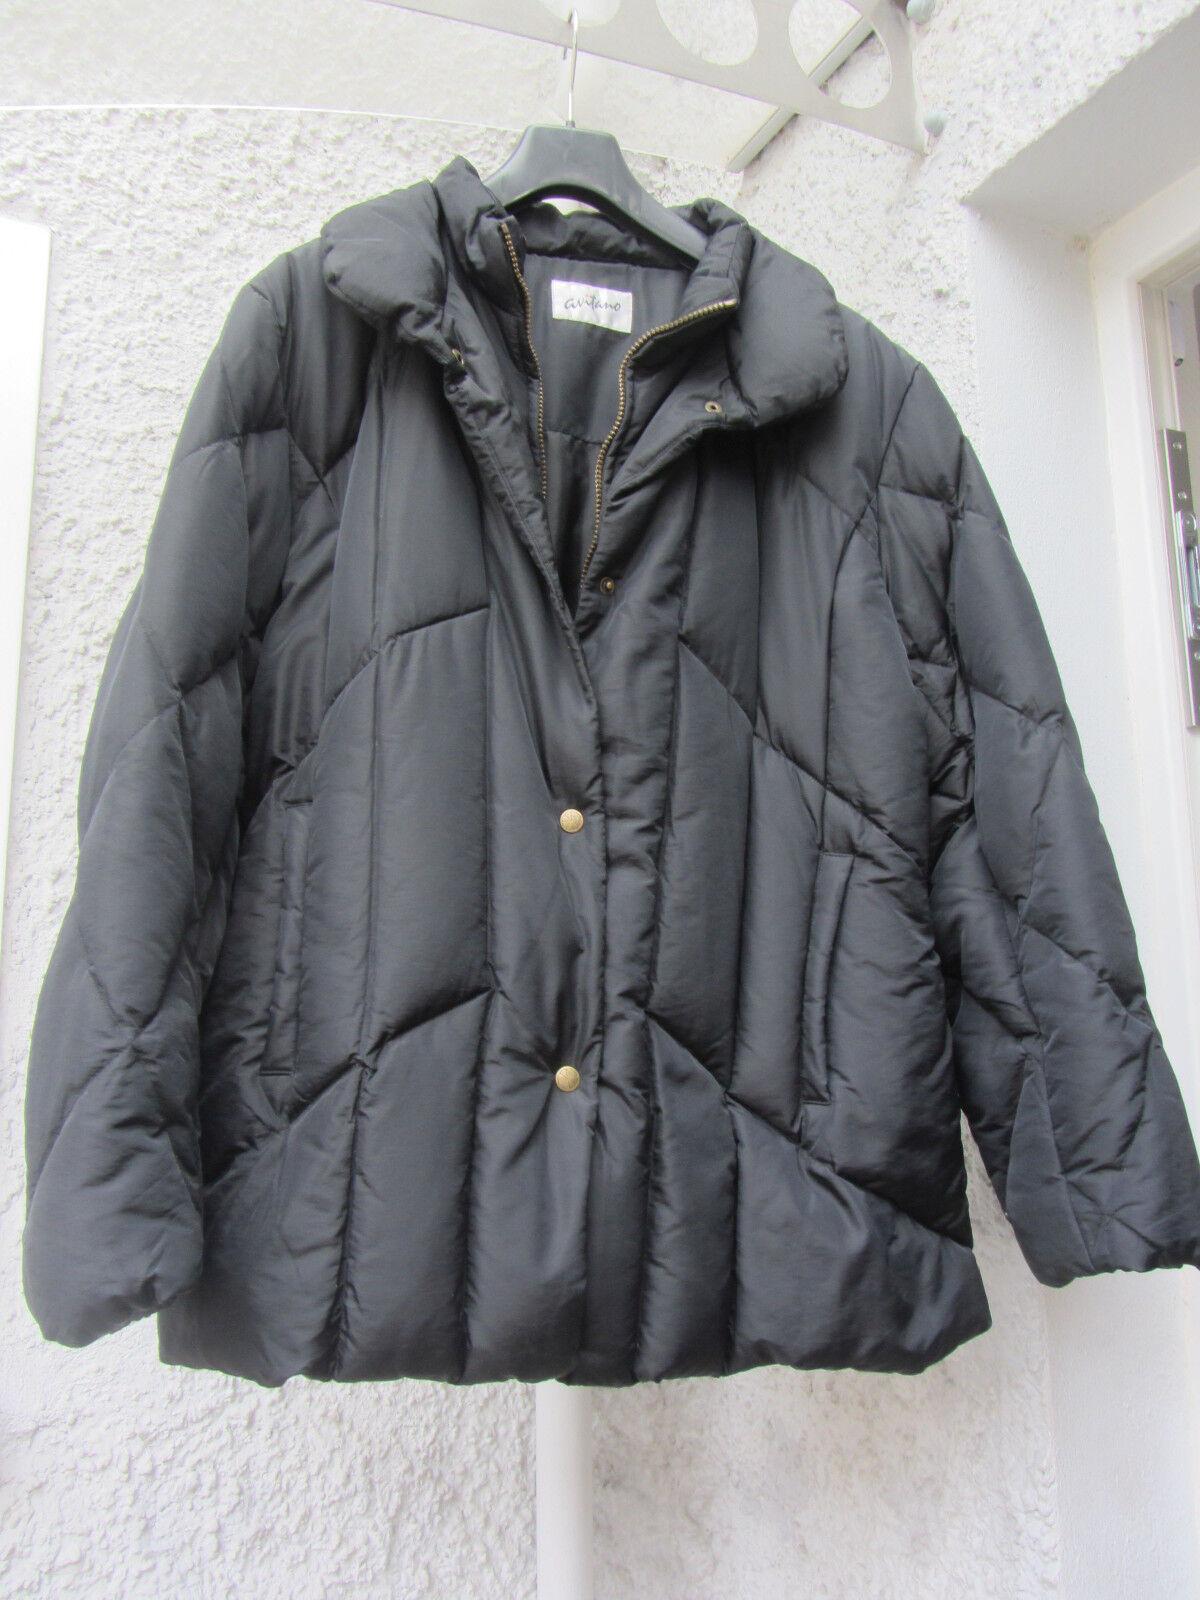 Avitano Winter Jacke schwarz Gr. 48 NEUW